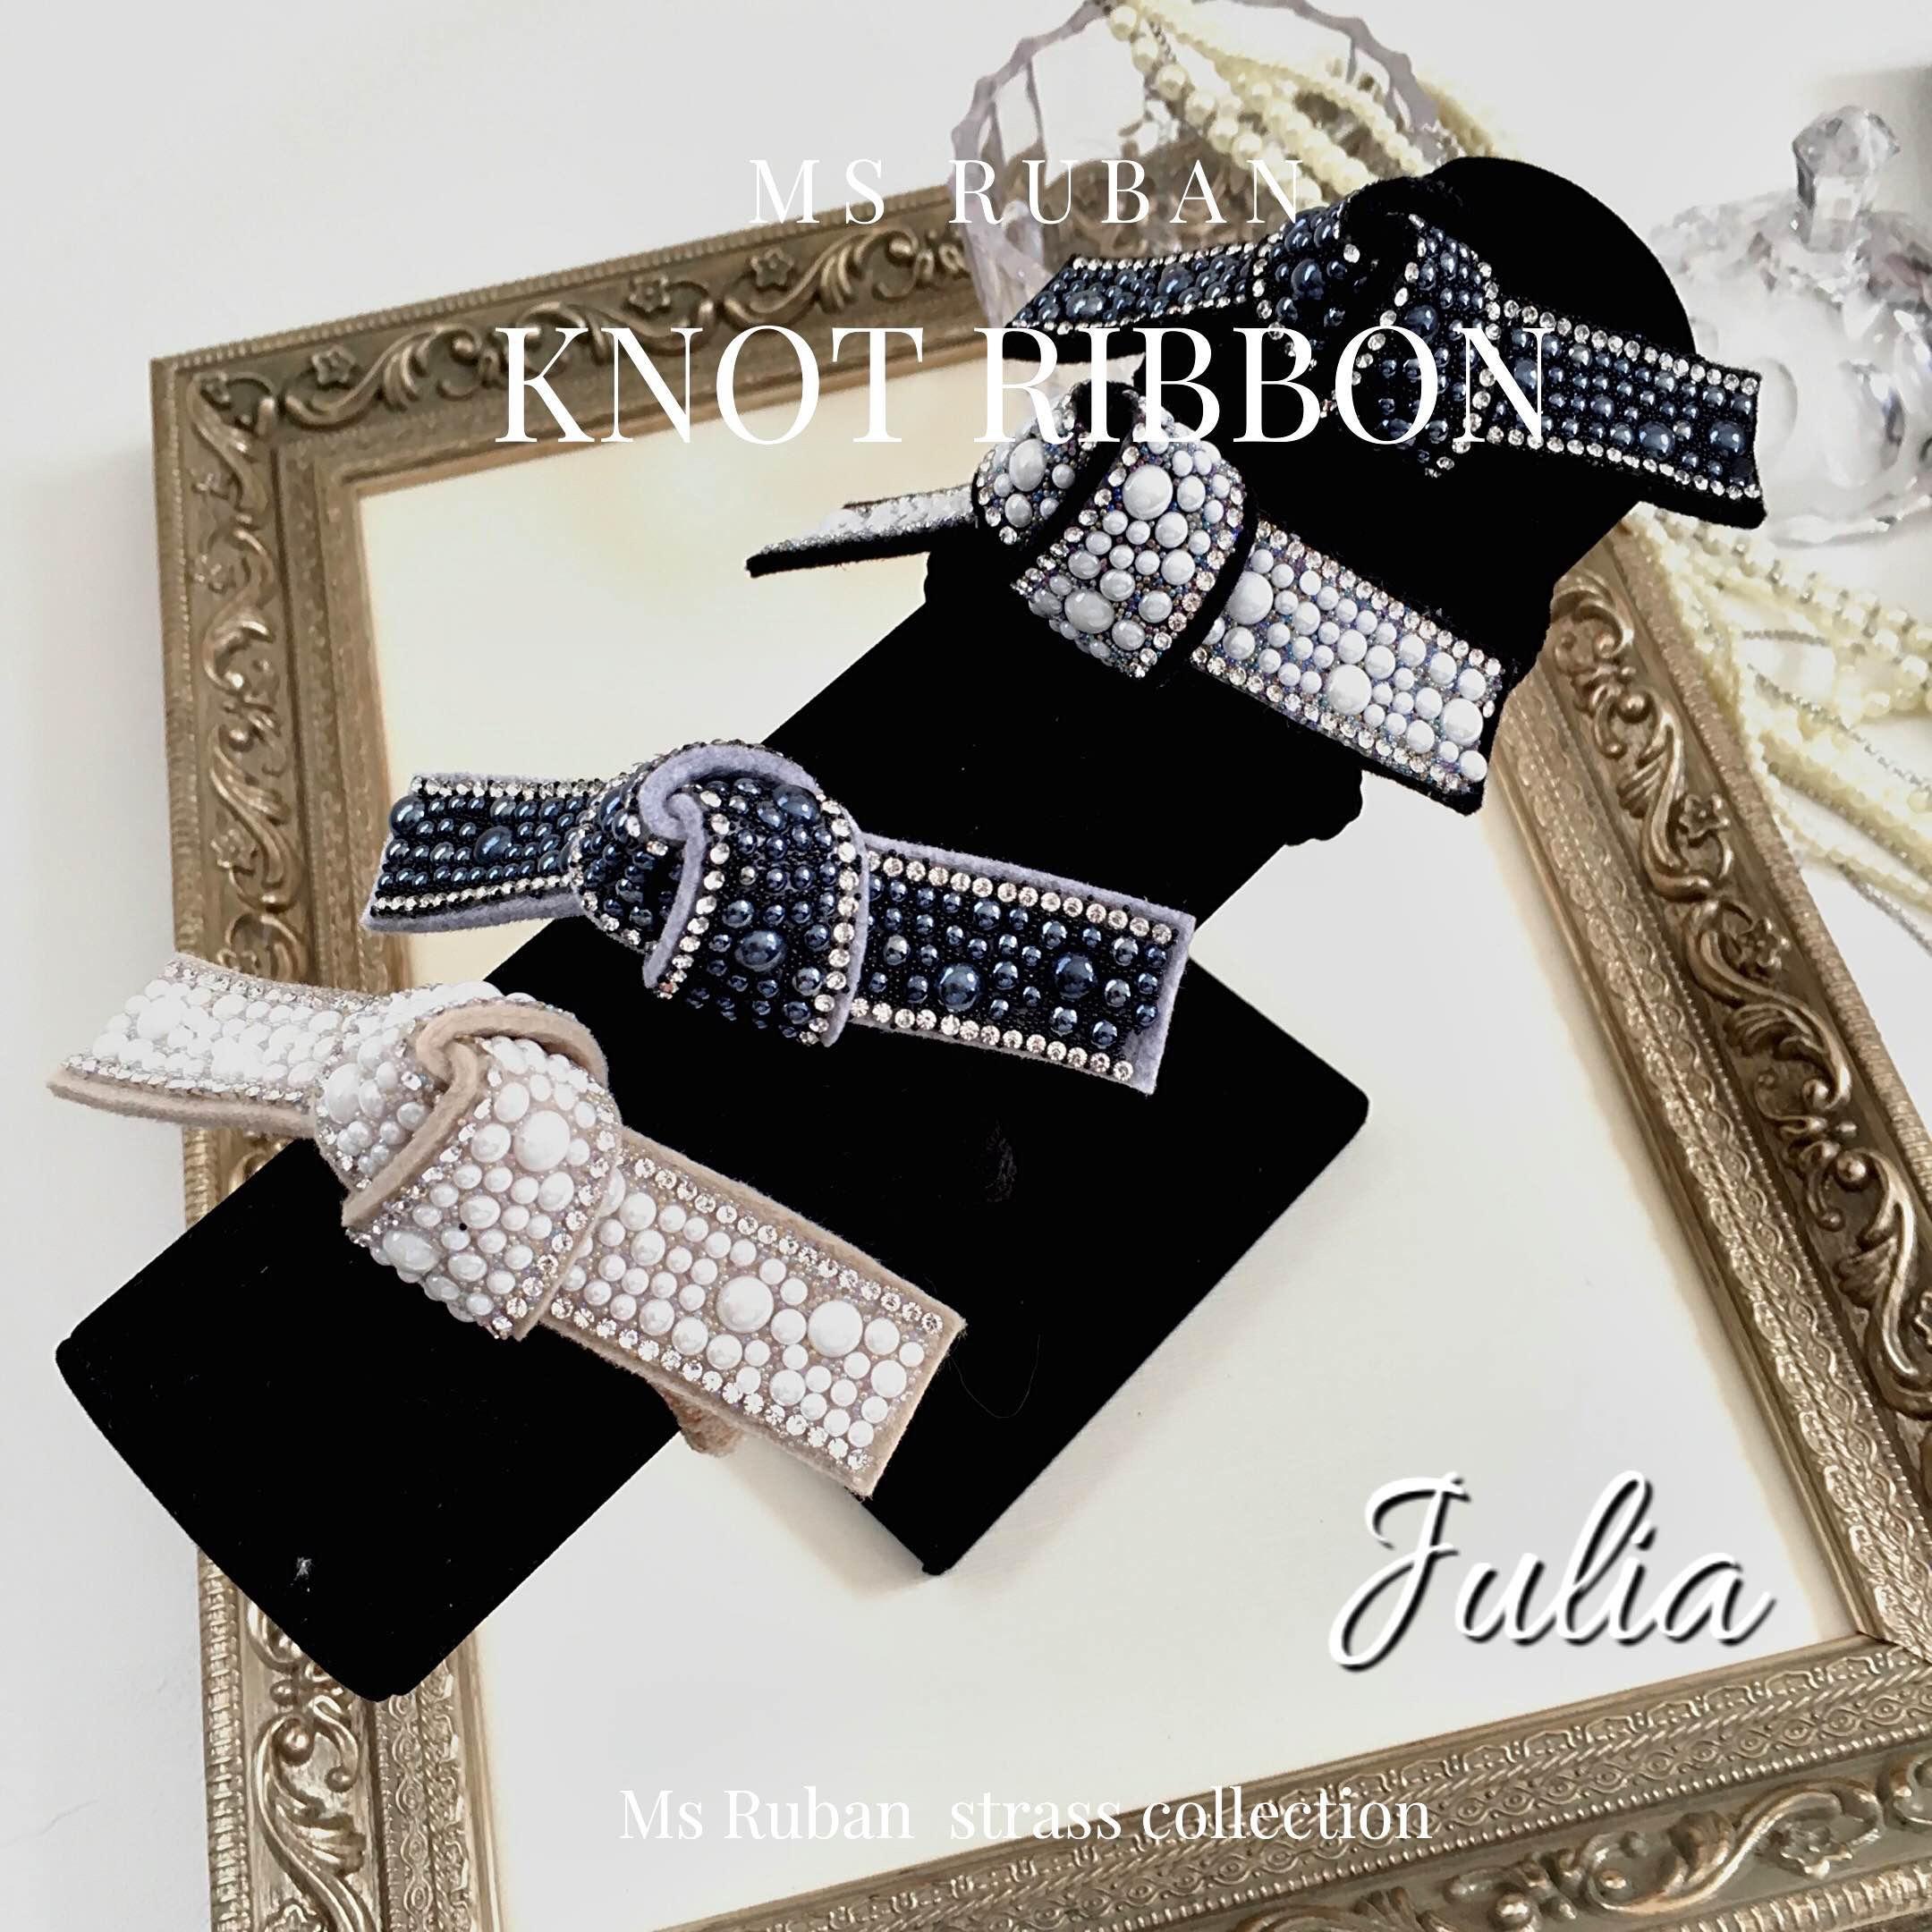 Knot ribbon Julia ジュリア 大人可愛いヘアアクセ